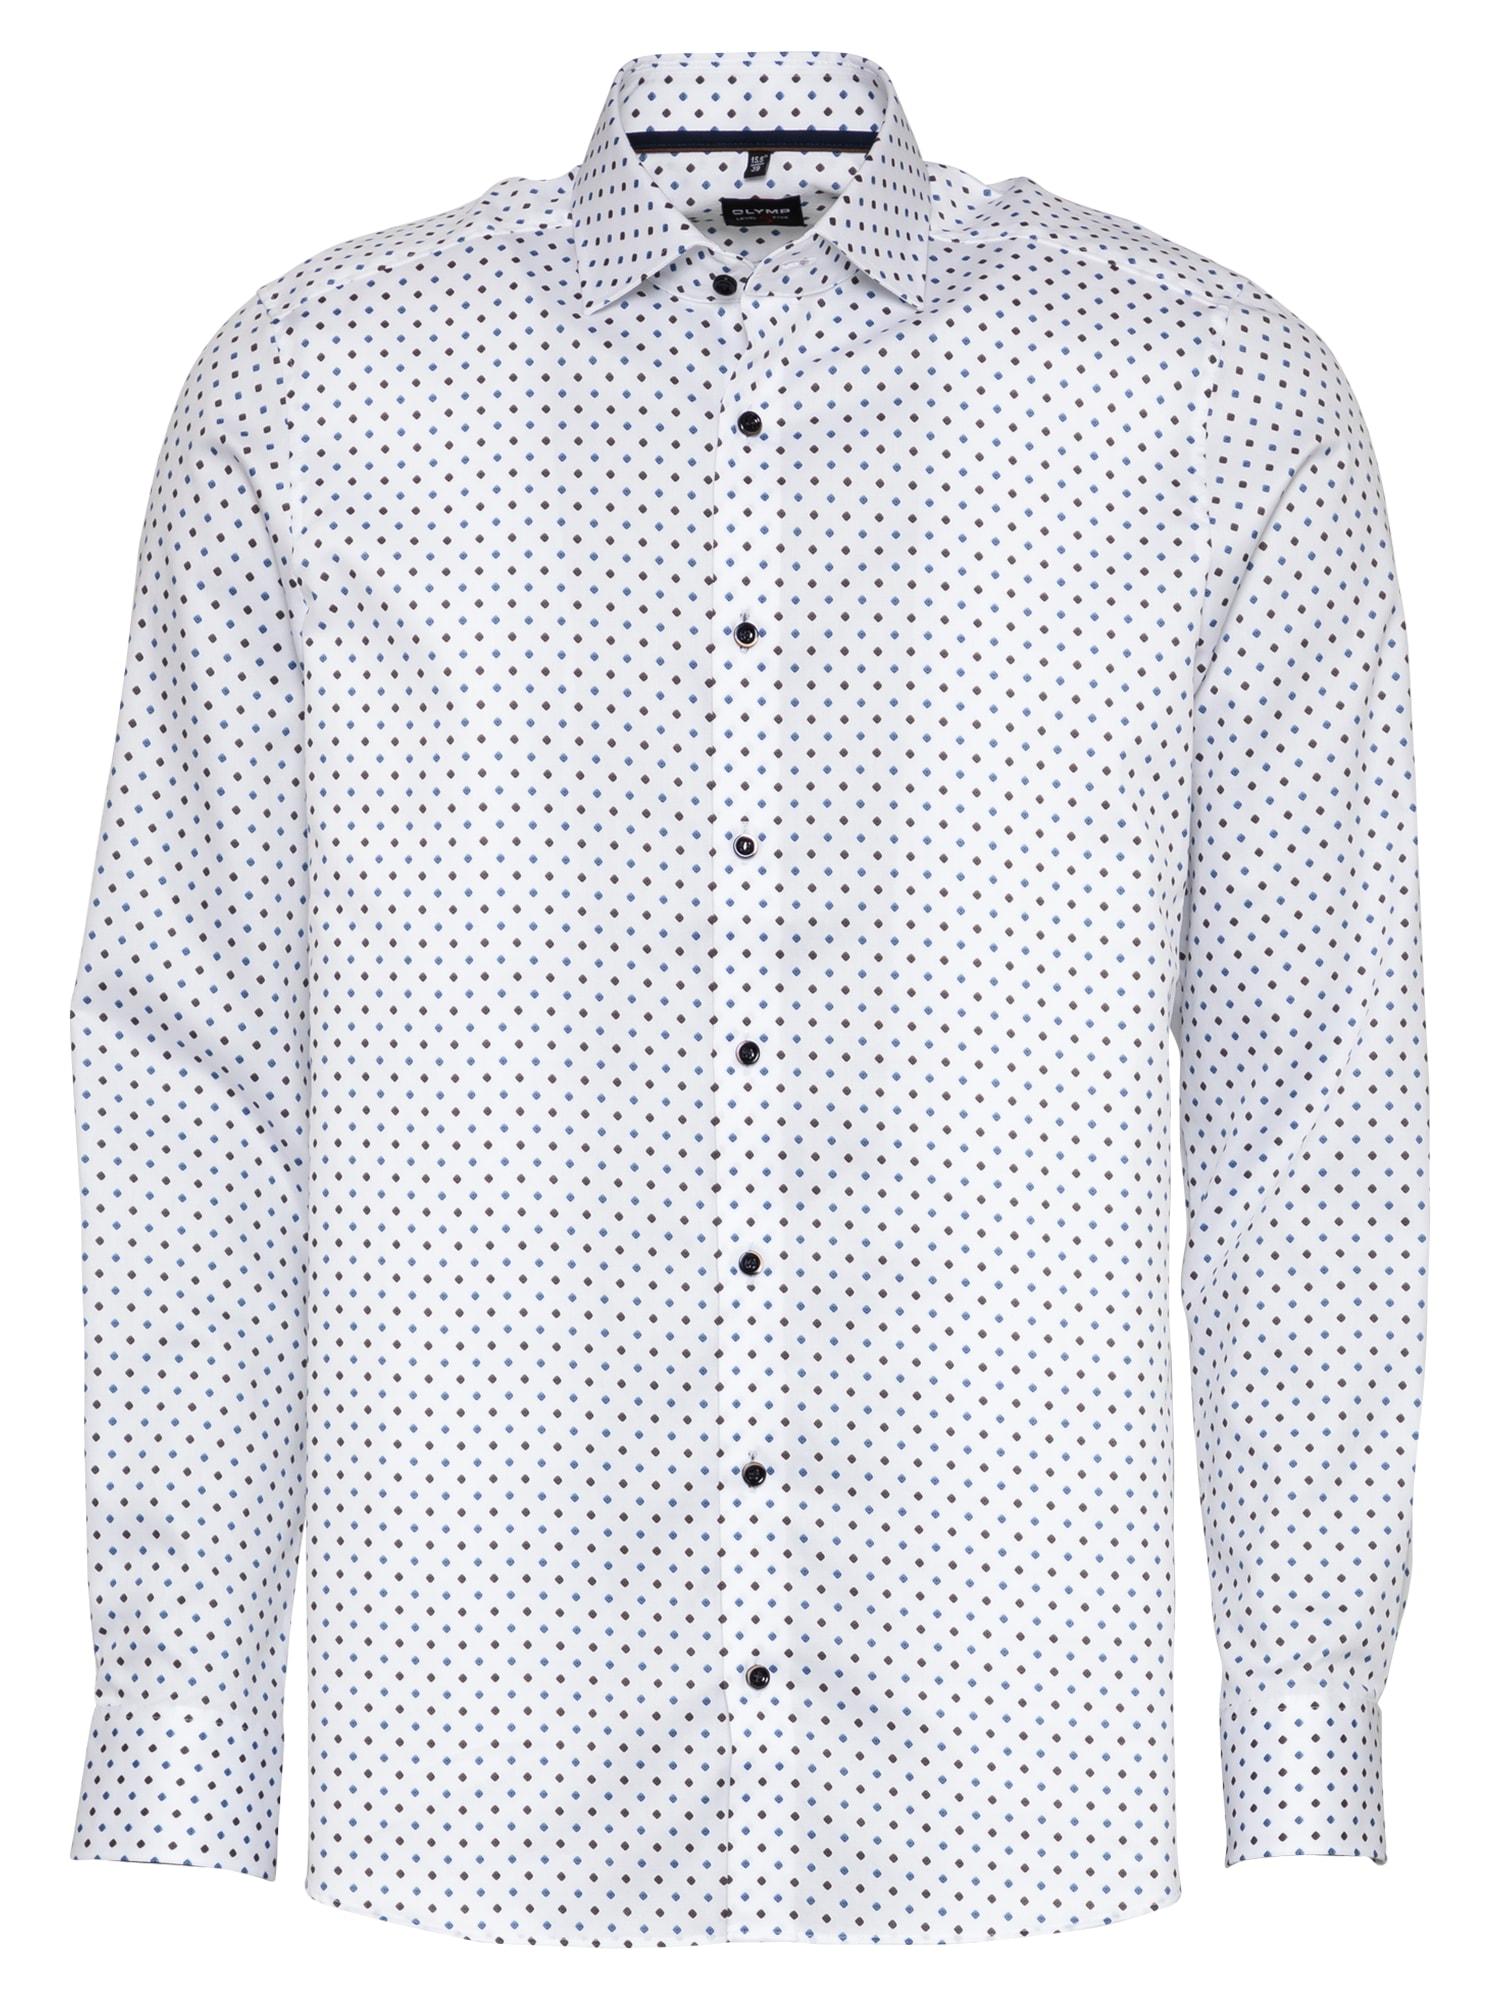 OLYMP Marškiniai ruda / balta / mėlyna